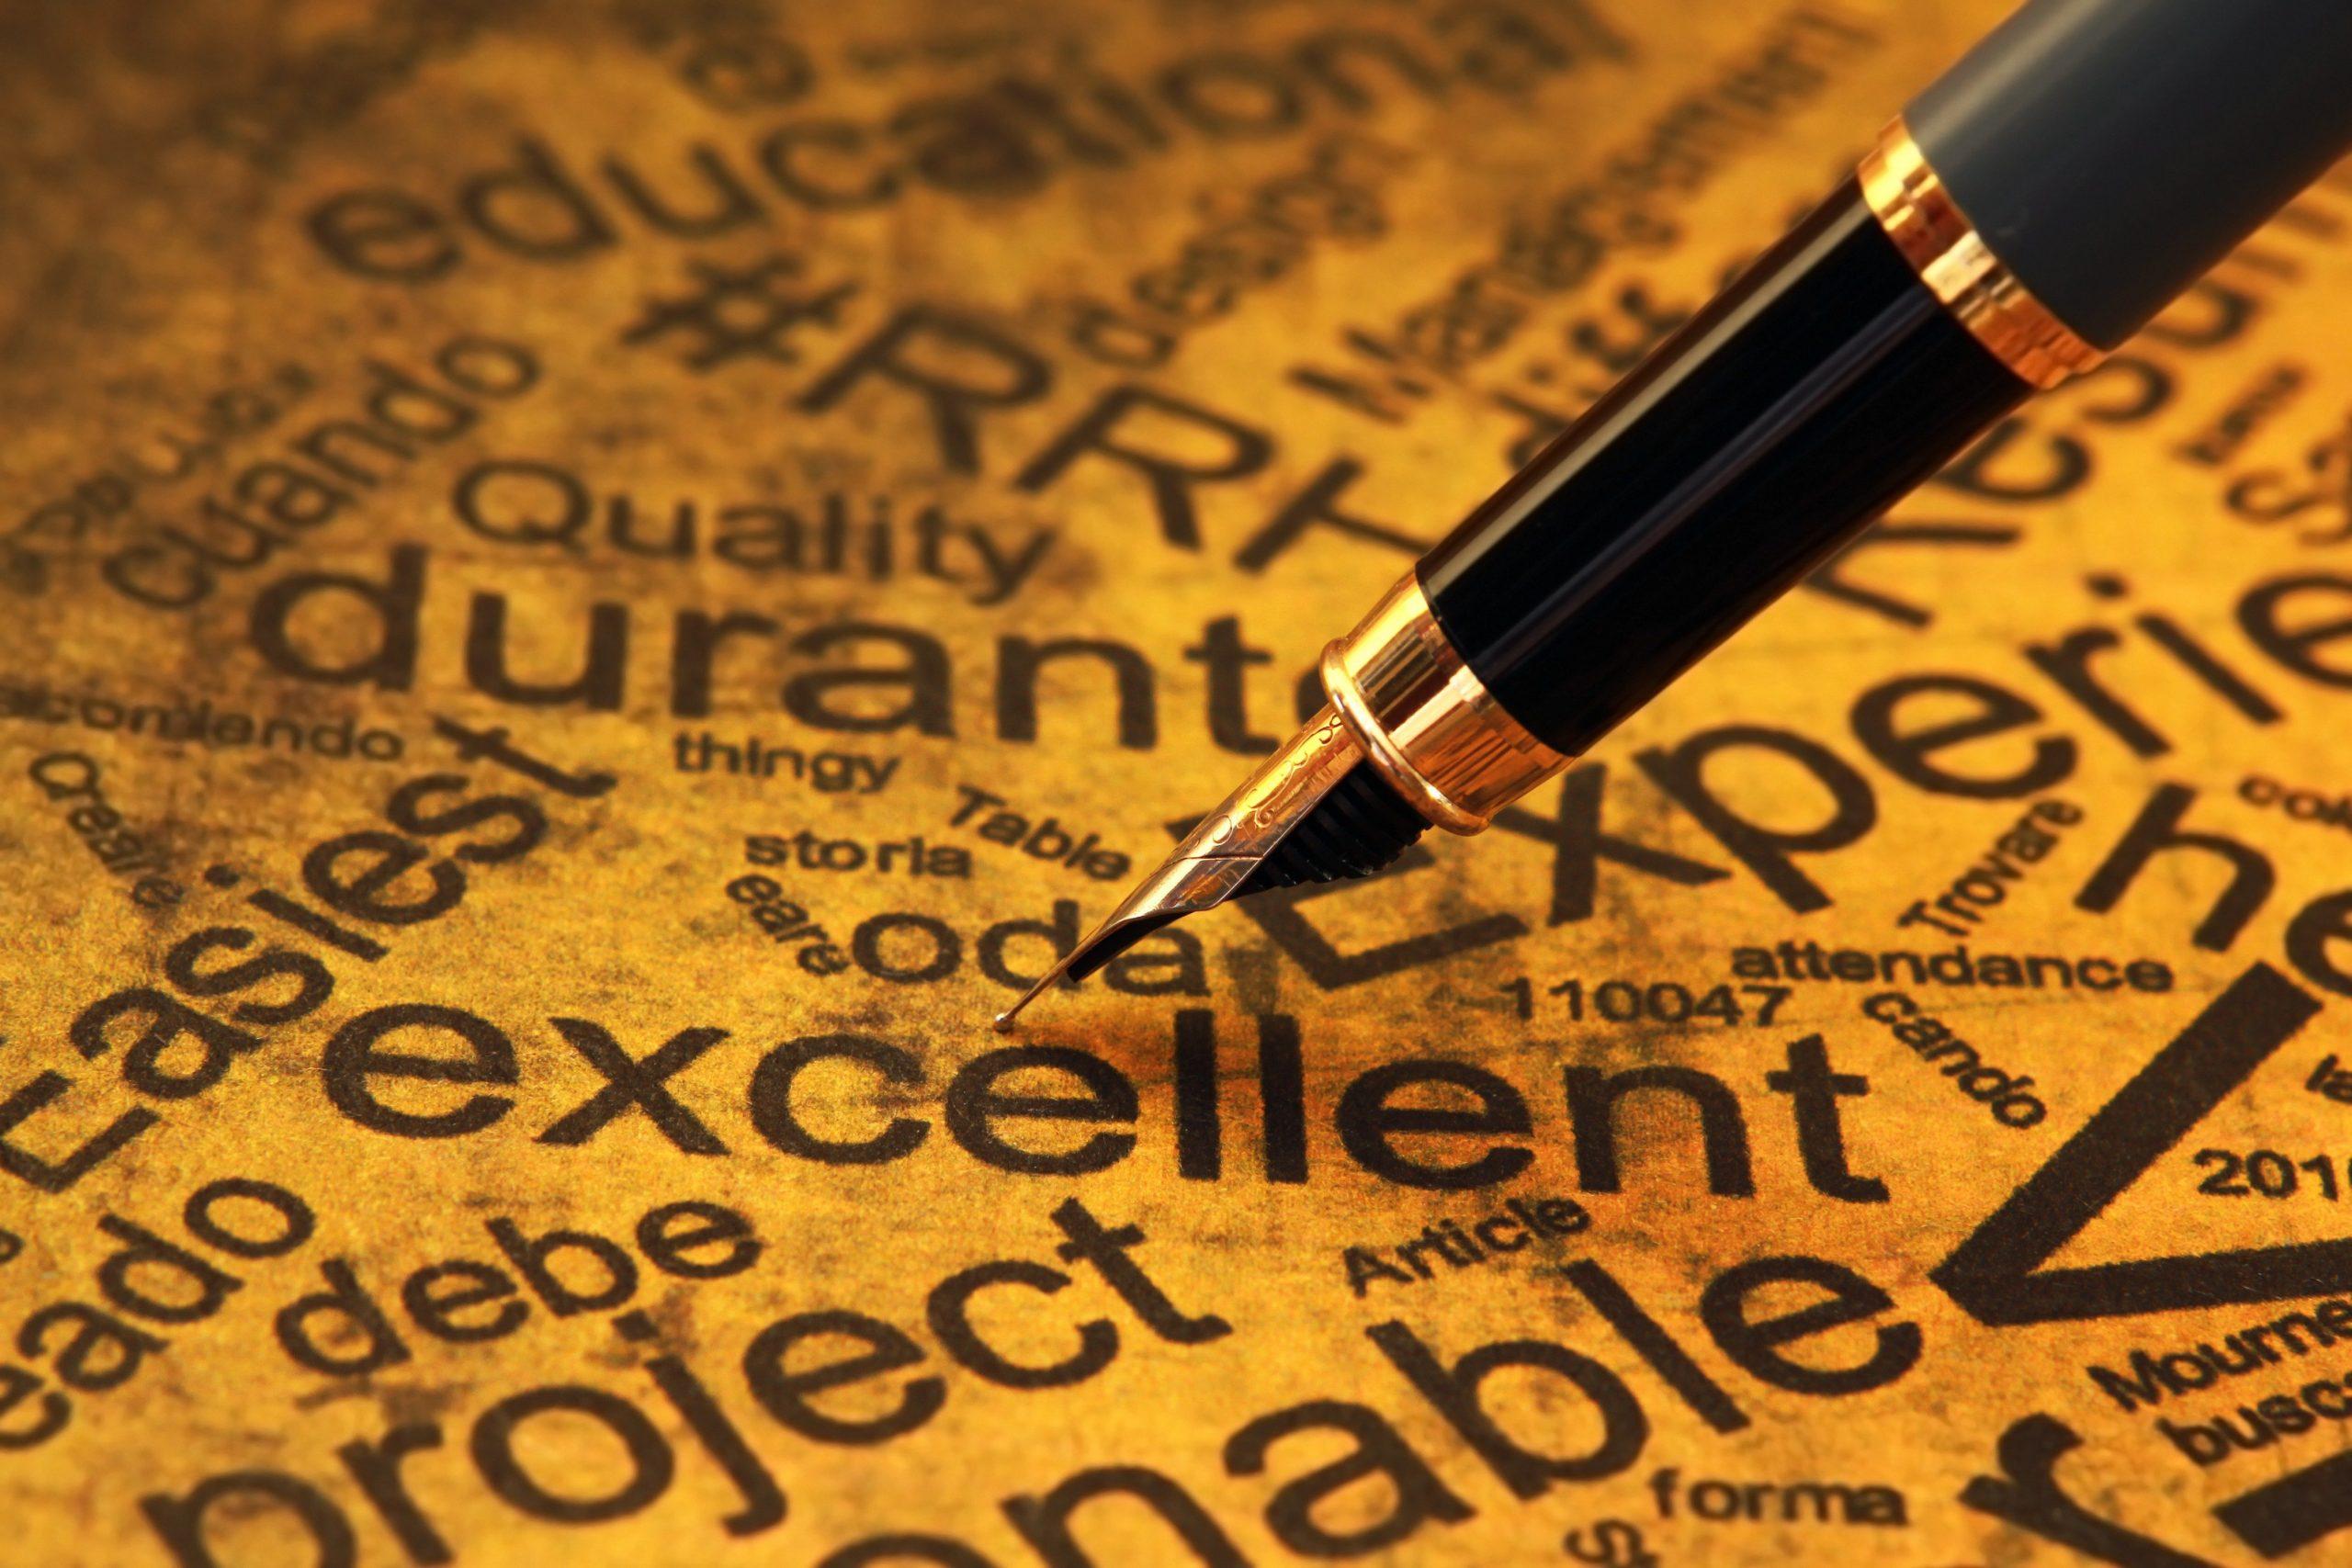 Thrane Media - Kommunikationsrådgivning og issue-management